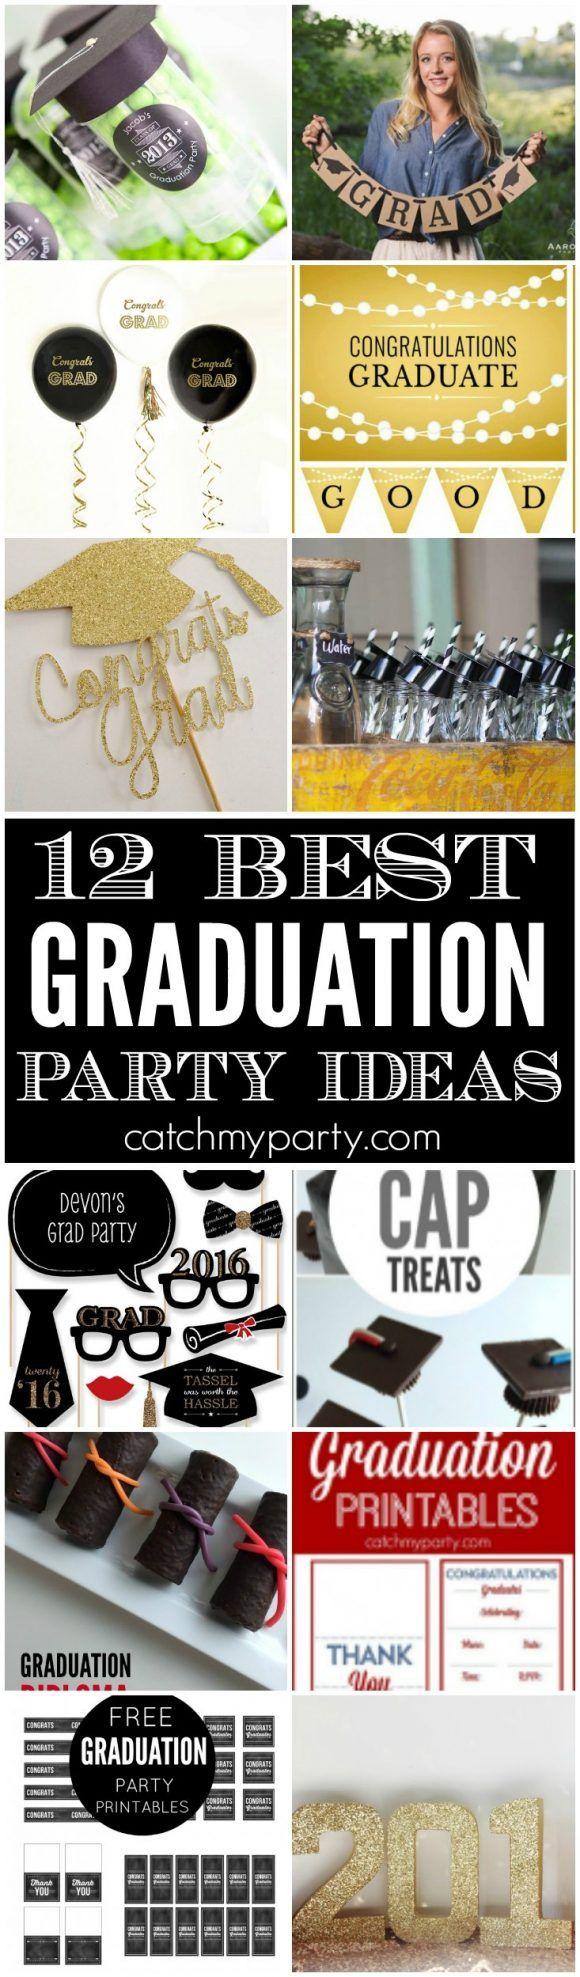 12 Best Graduation Party Ideas including decorations